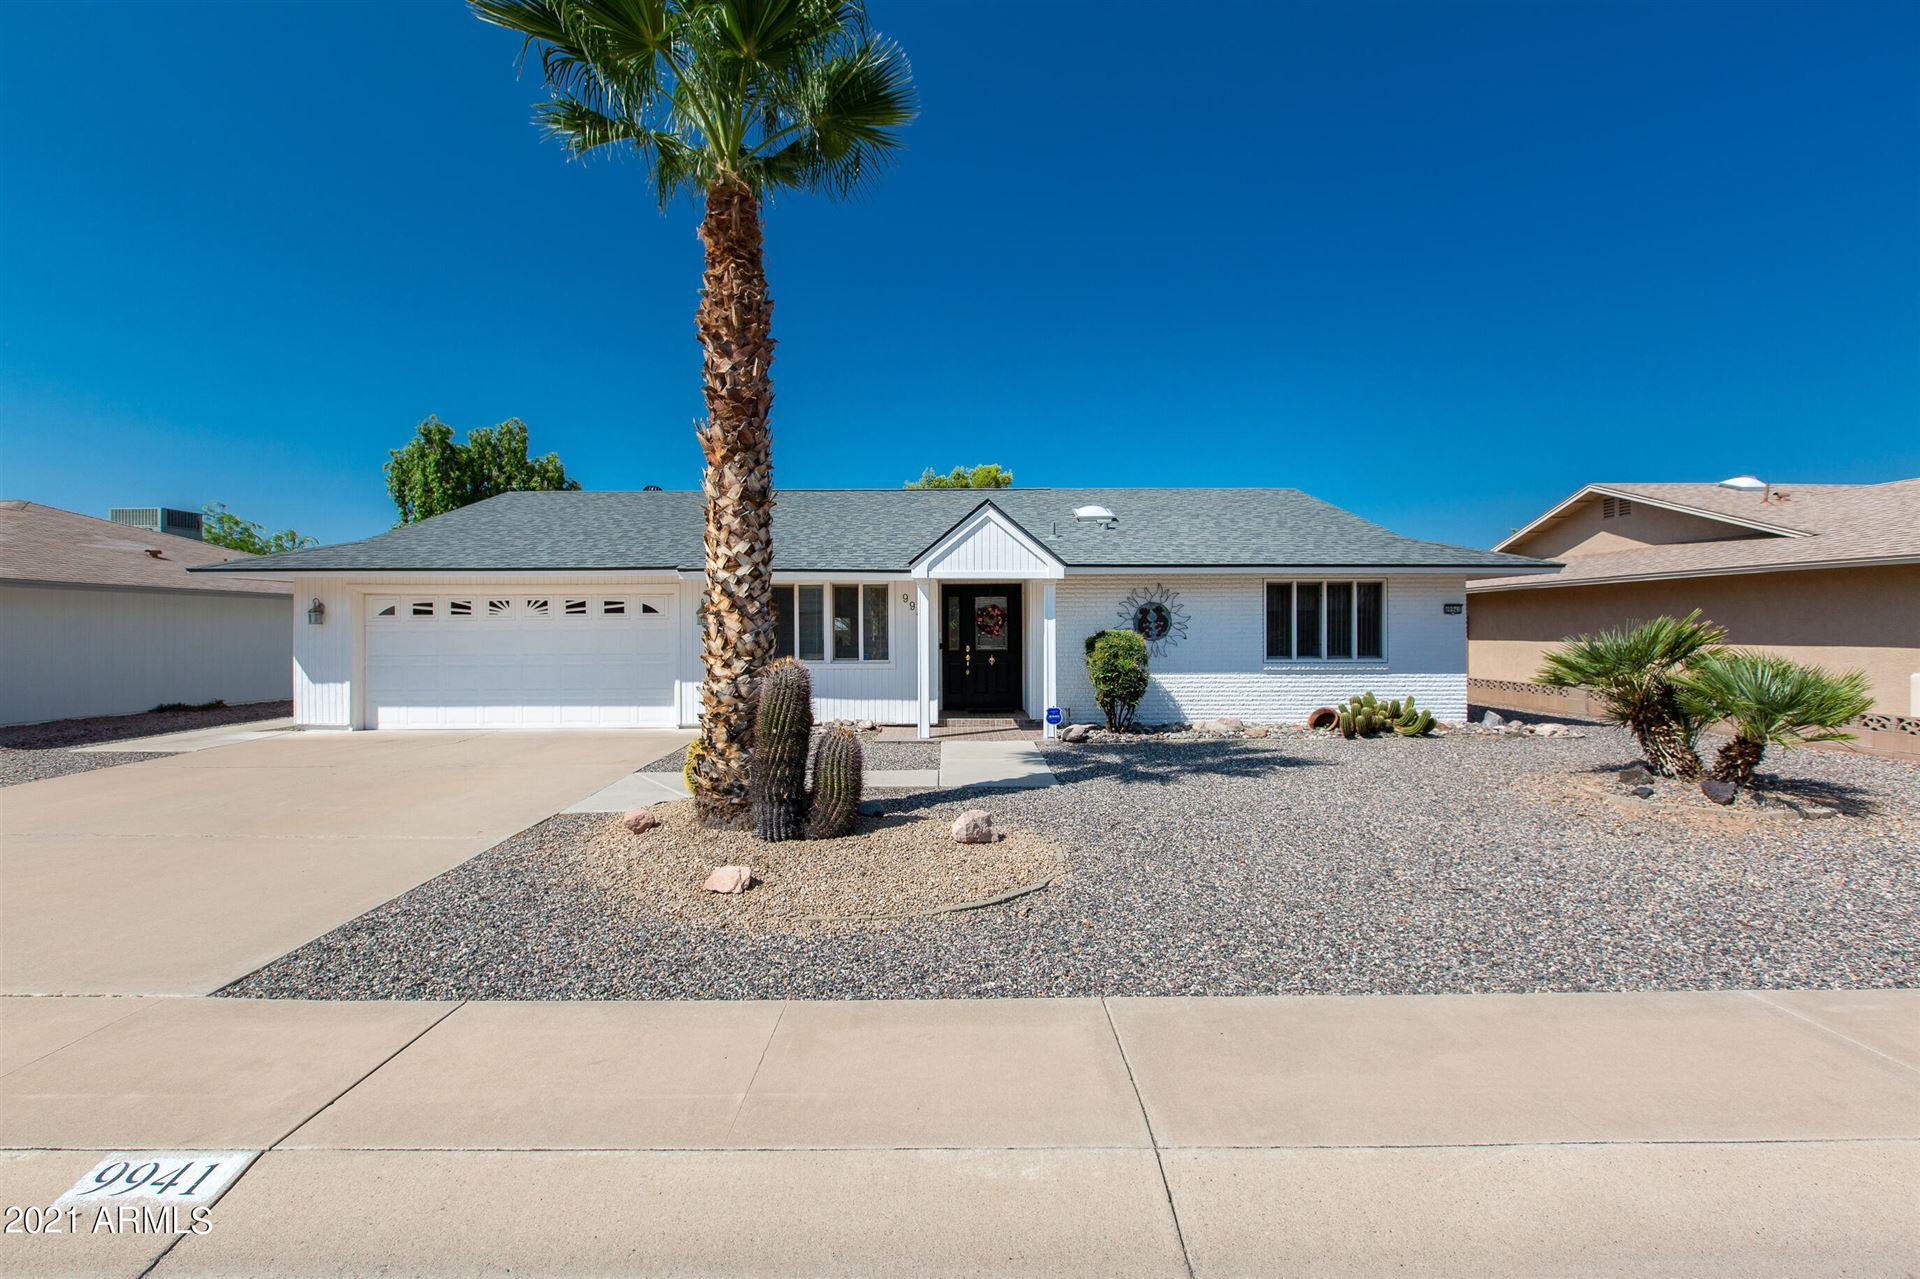 Photo of 9941 W CONCHO Circle, Sun City, AZ 85373 (MLS # 6295299)